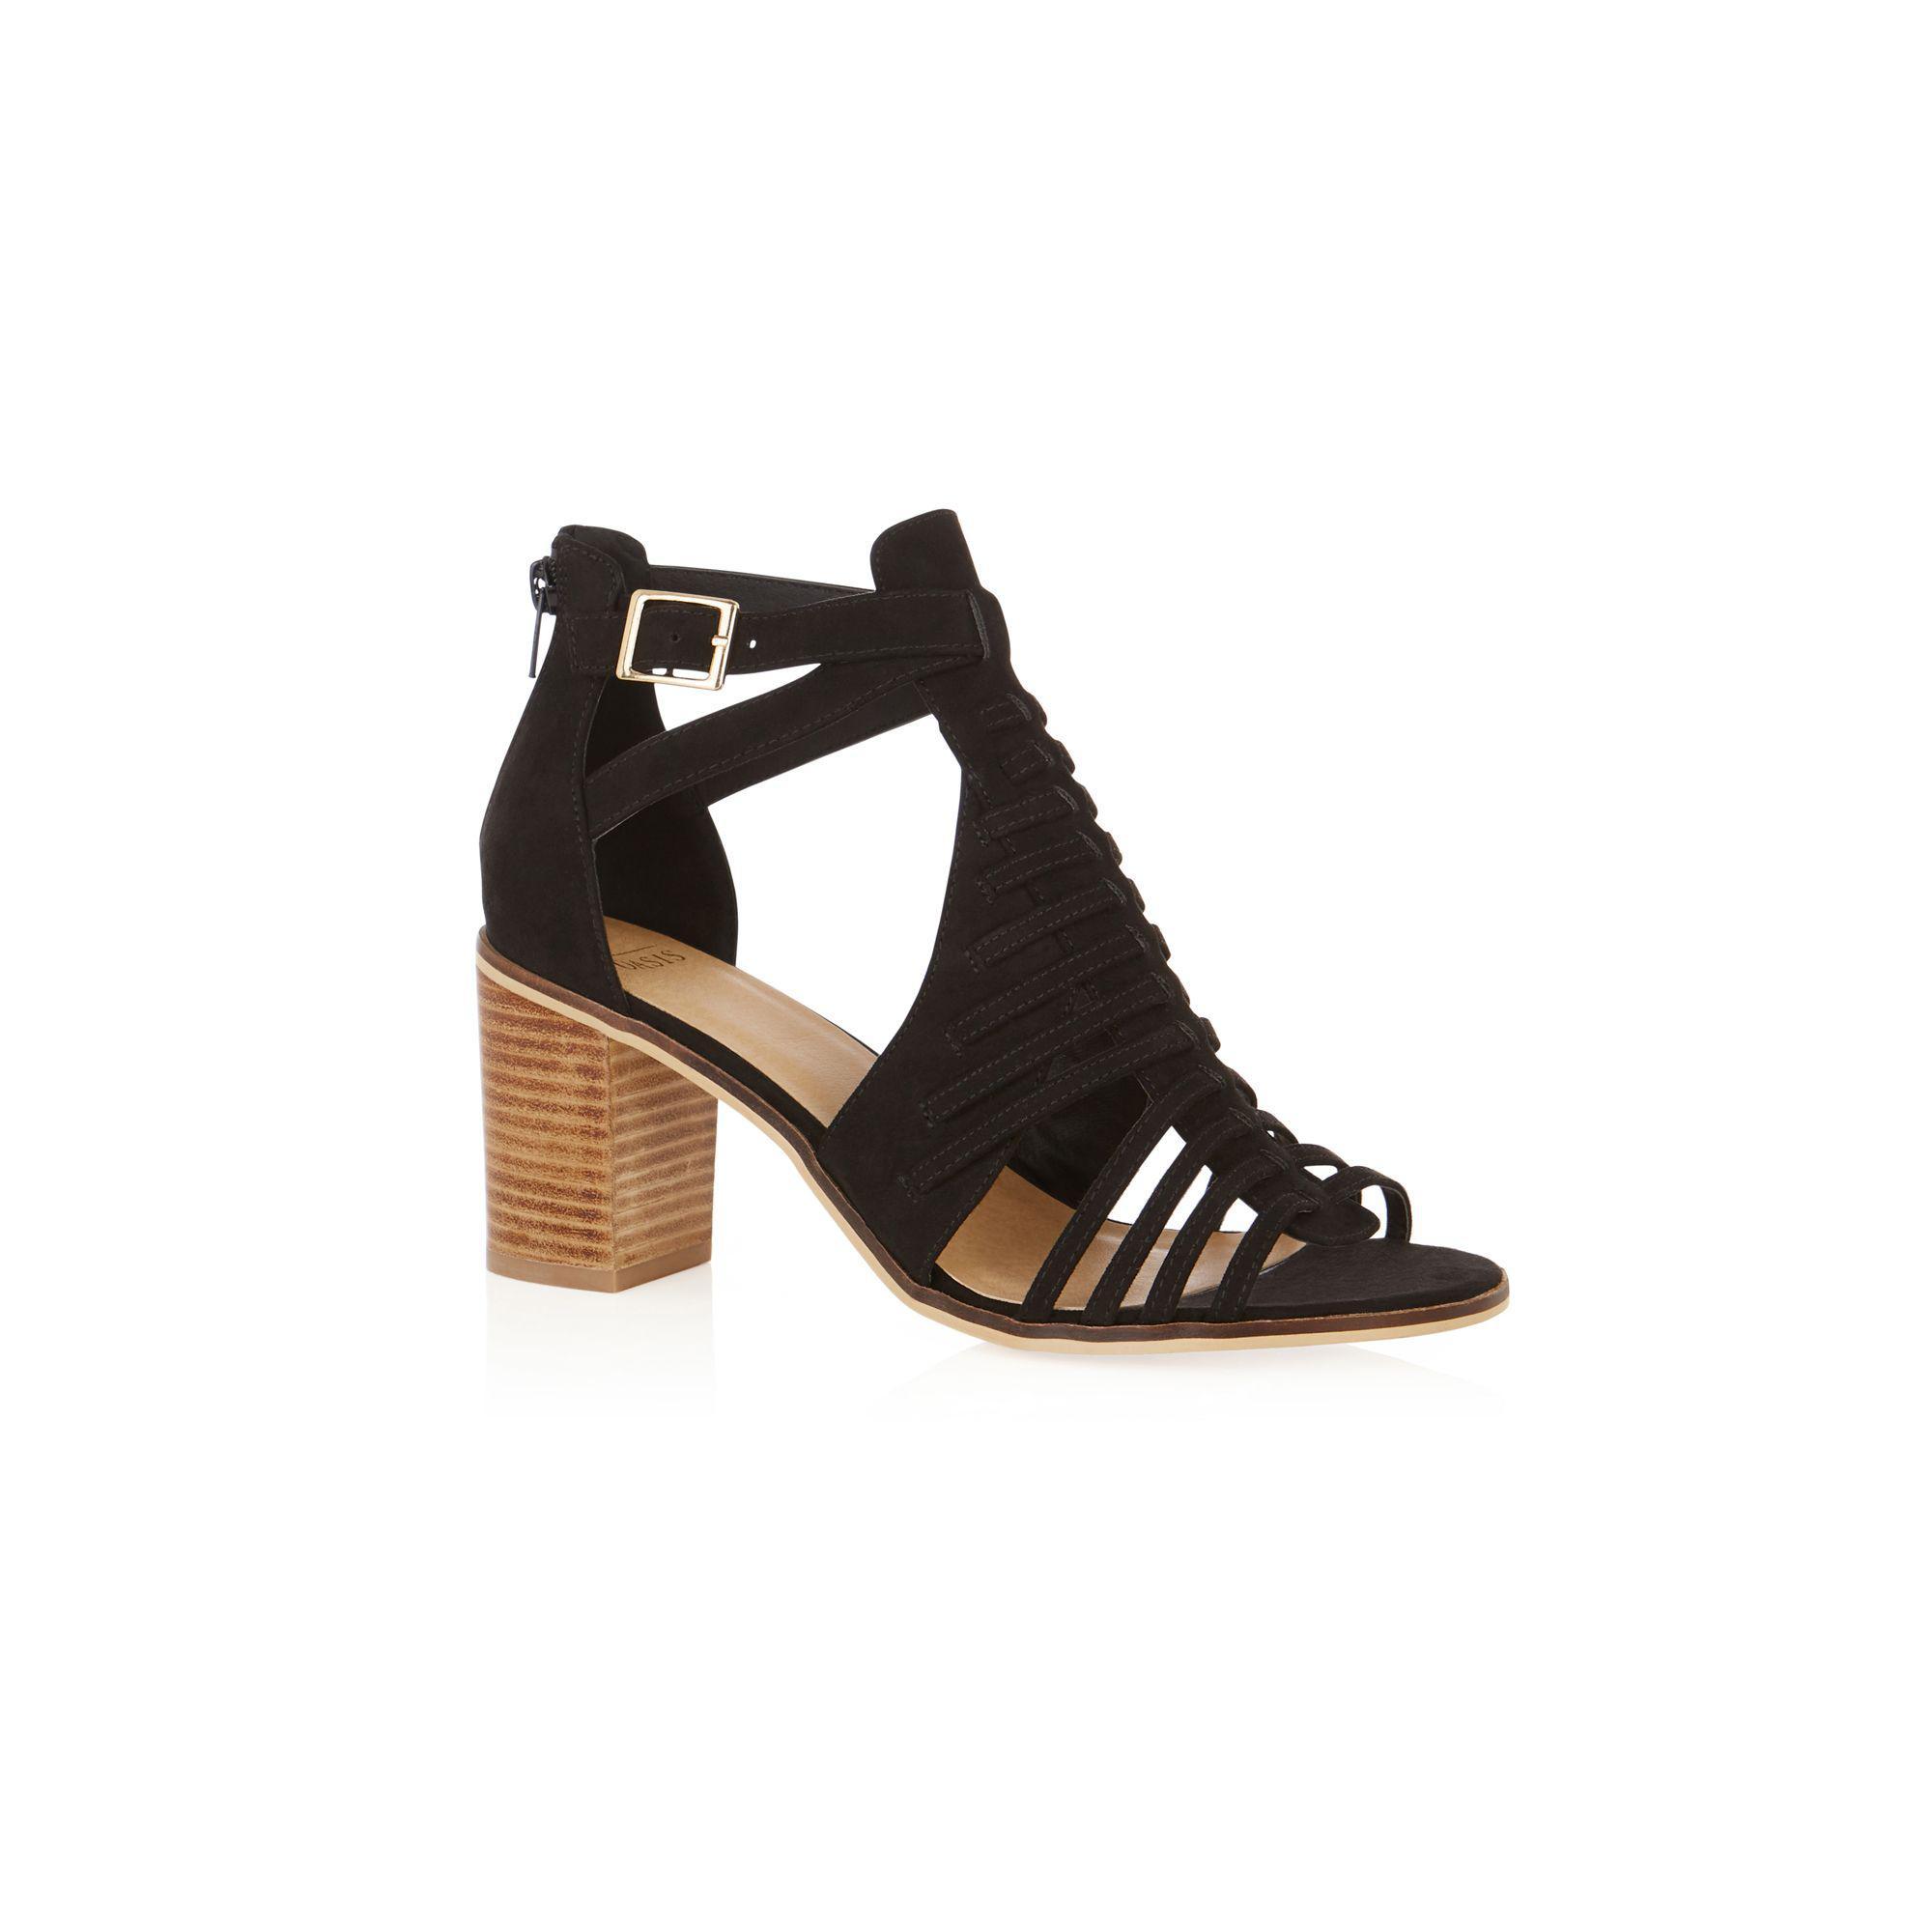 4cfc9359c634 Oasis Black 'millie' Strap Heeled Sandals in Black - Lyst